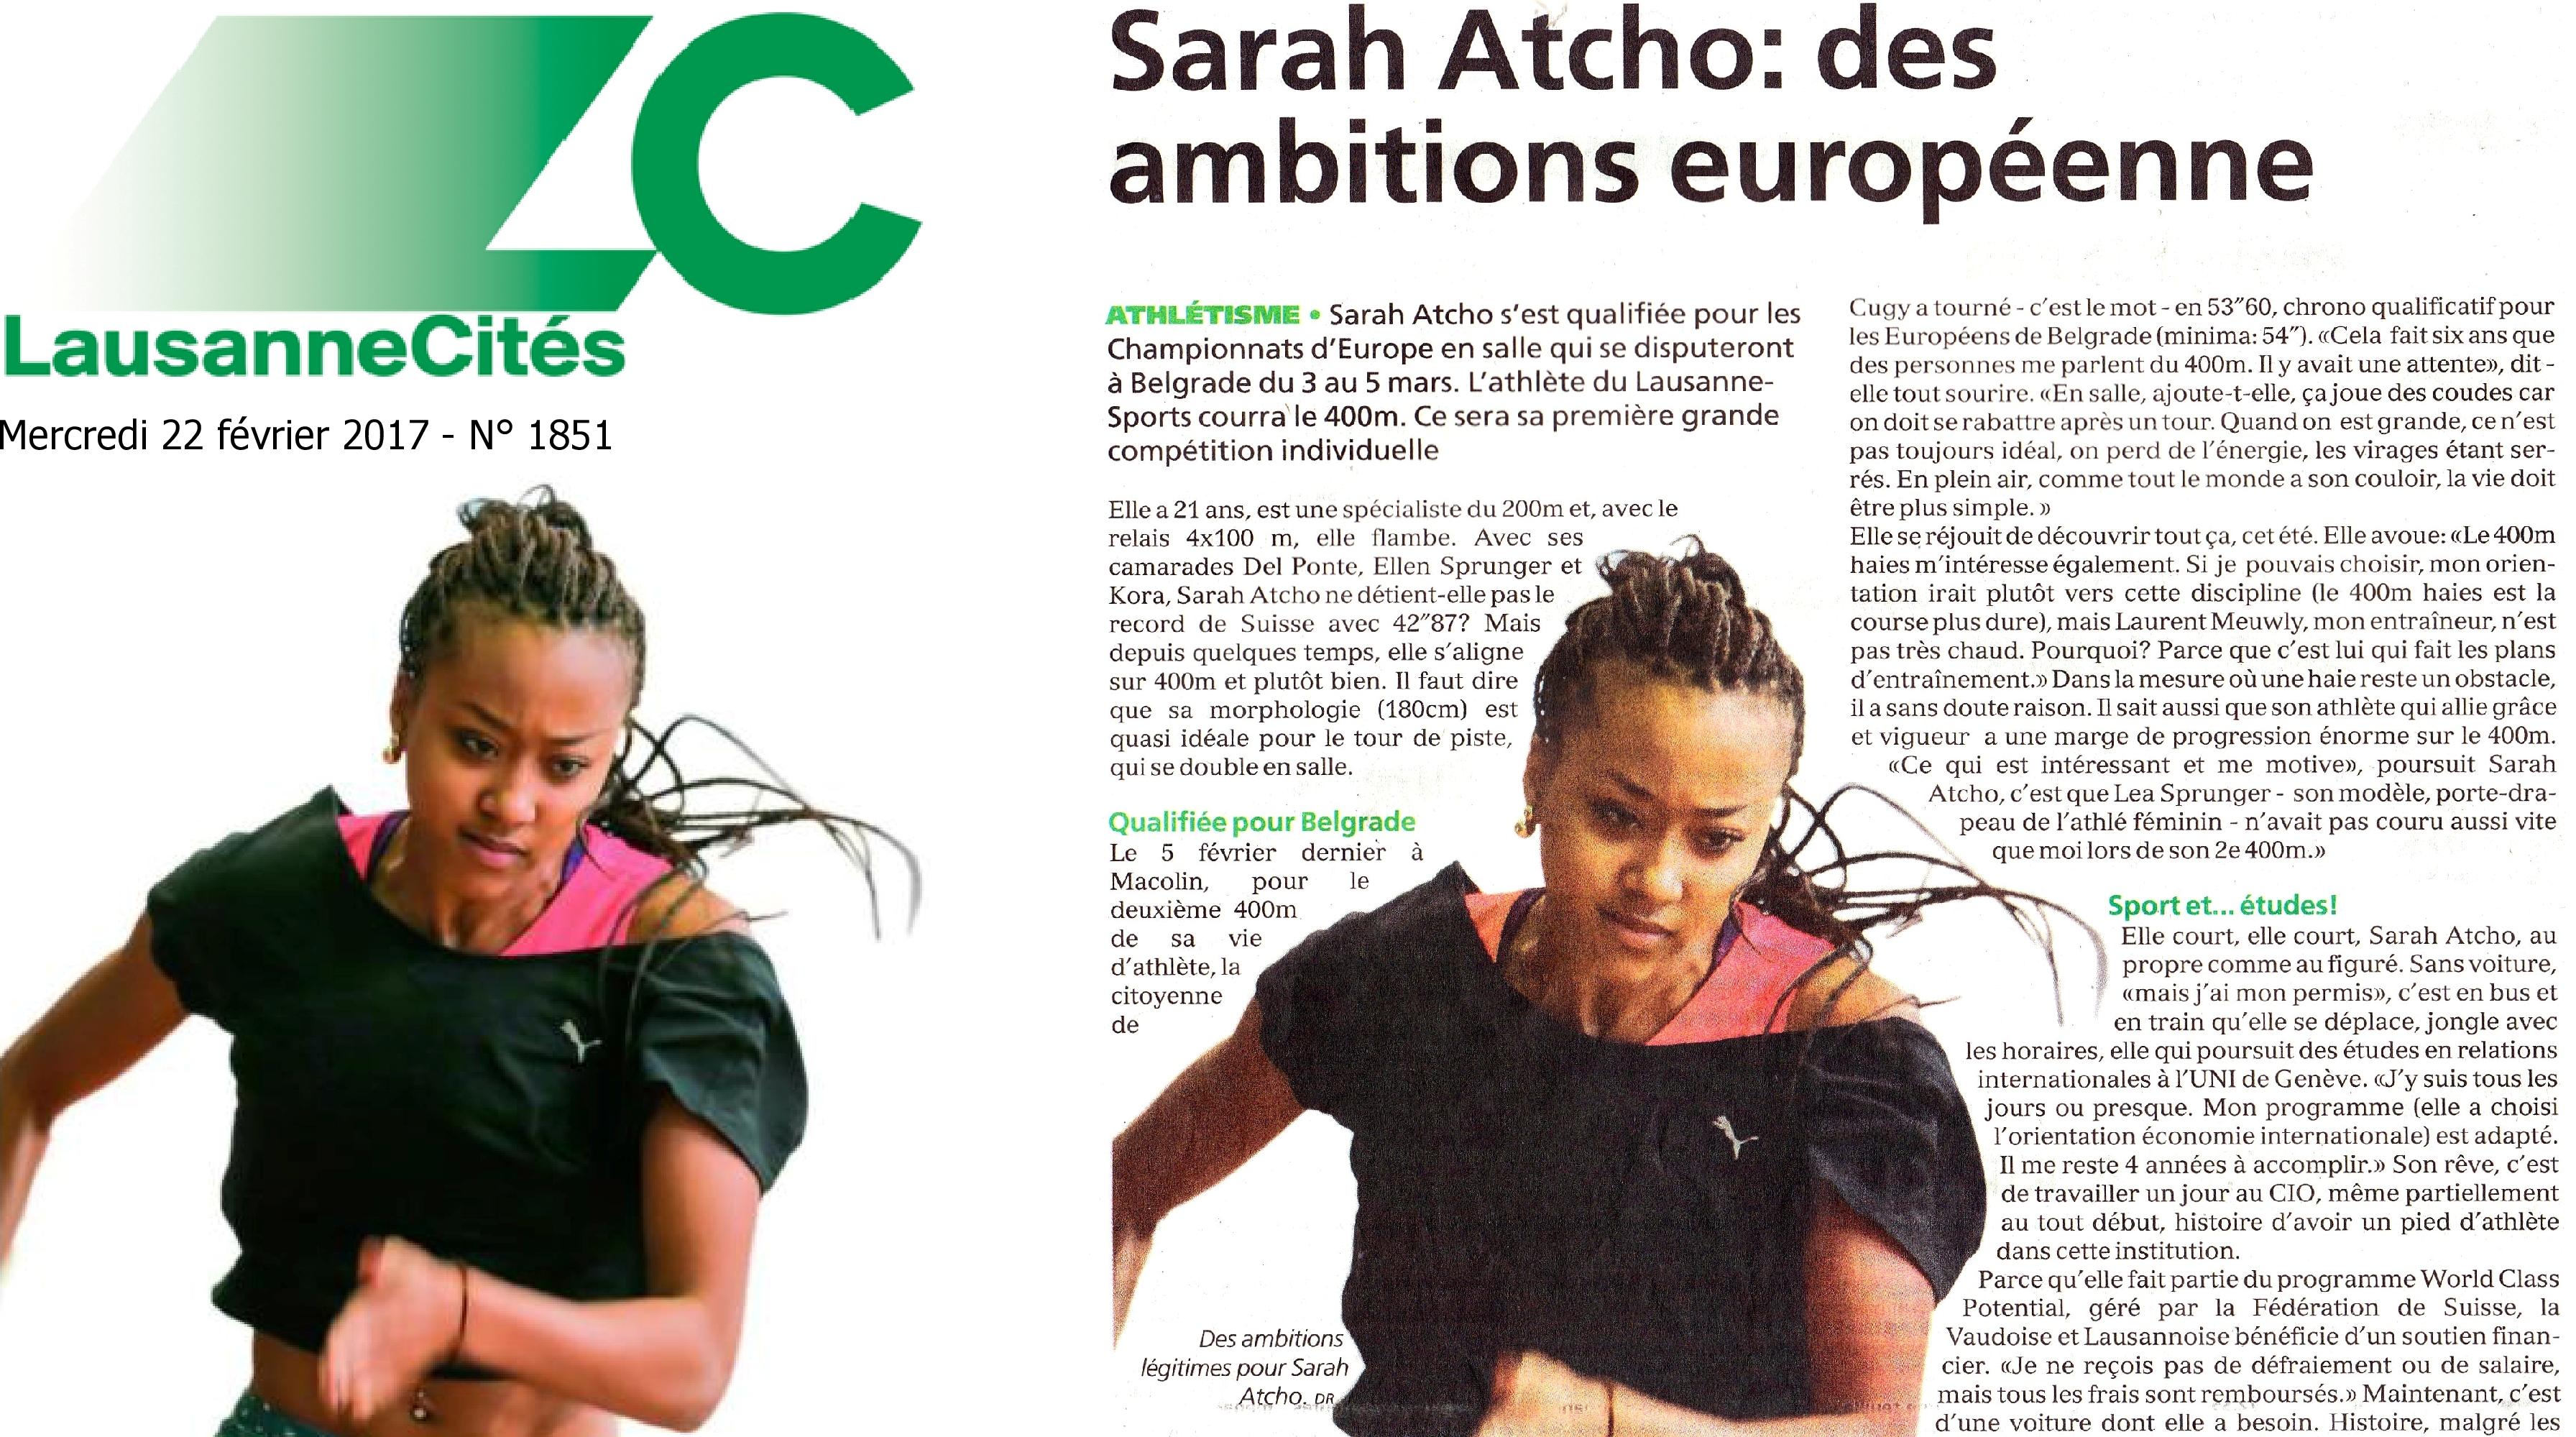 Revue de presse : Sarah Atcho